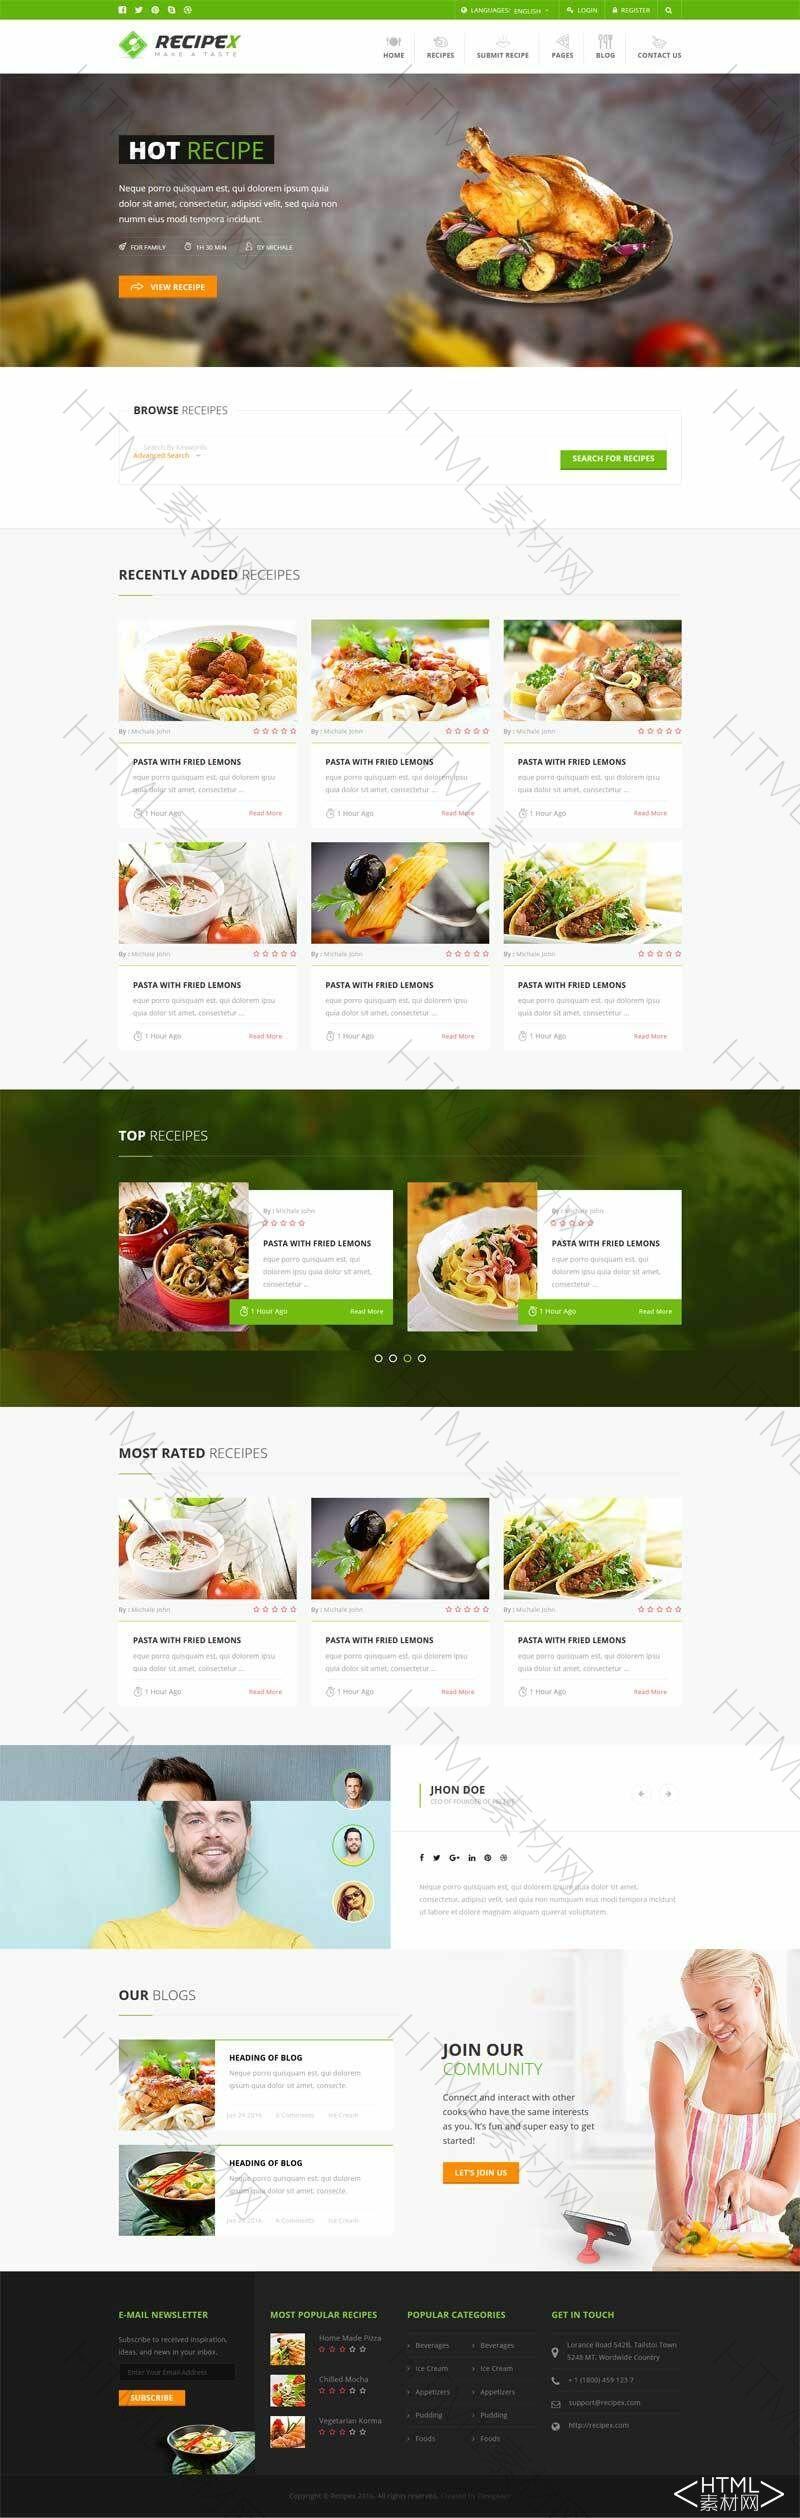 html5绿色的餐饮美食交流平台网站响应式模板.jpg